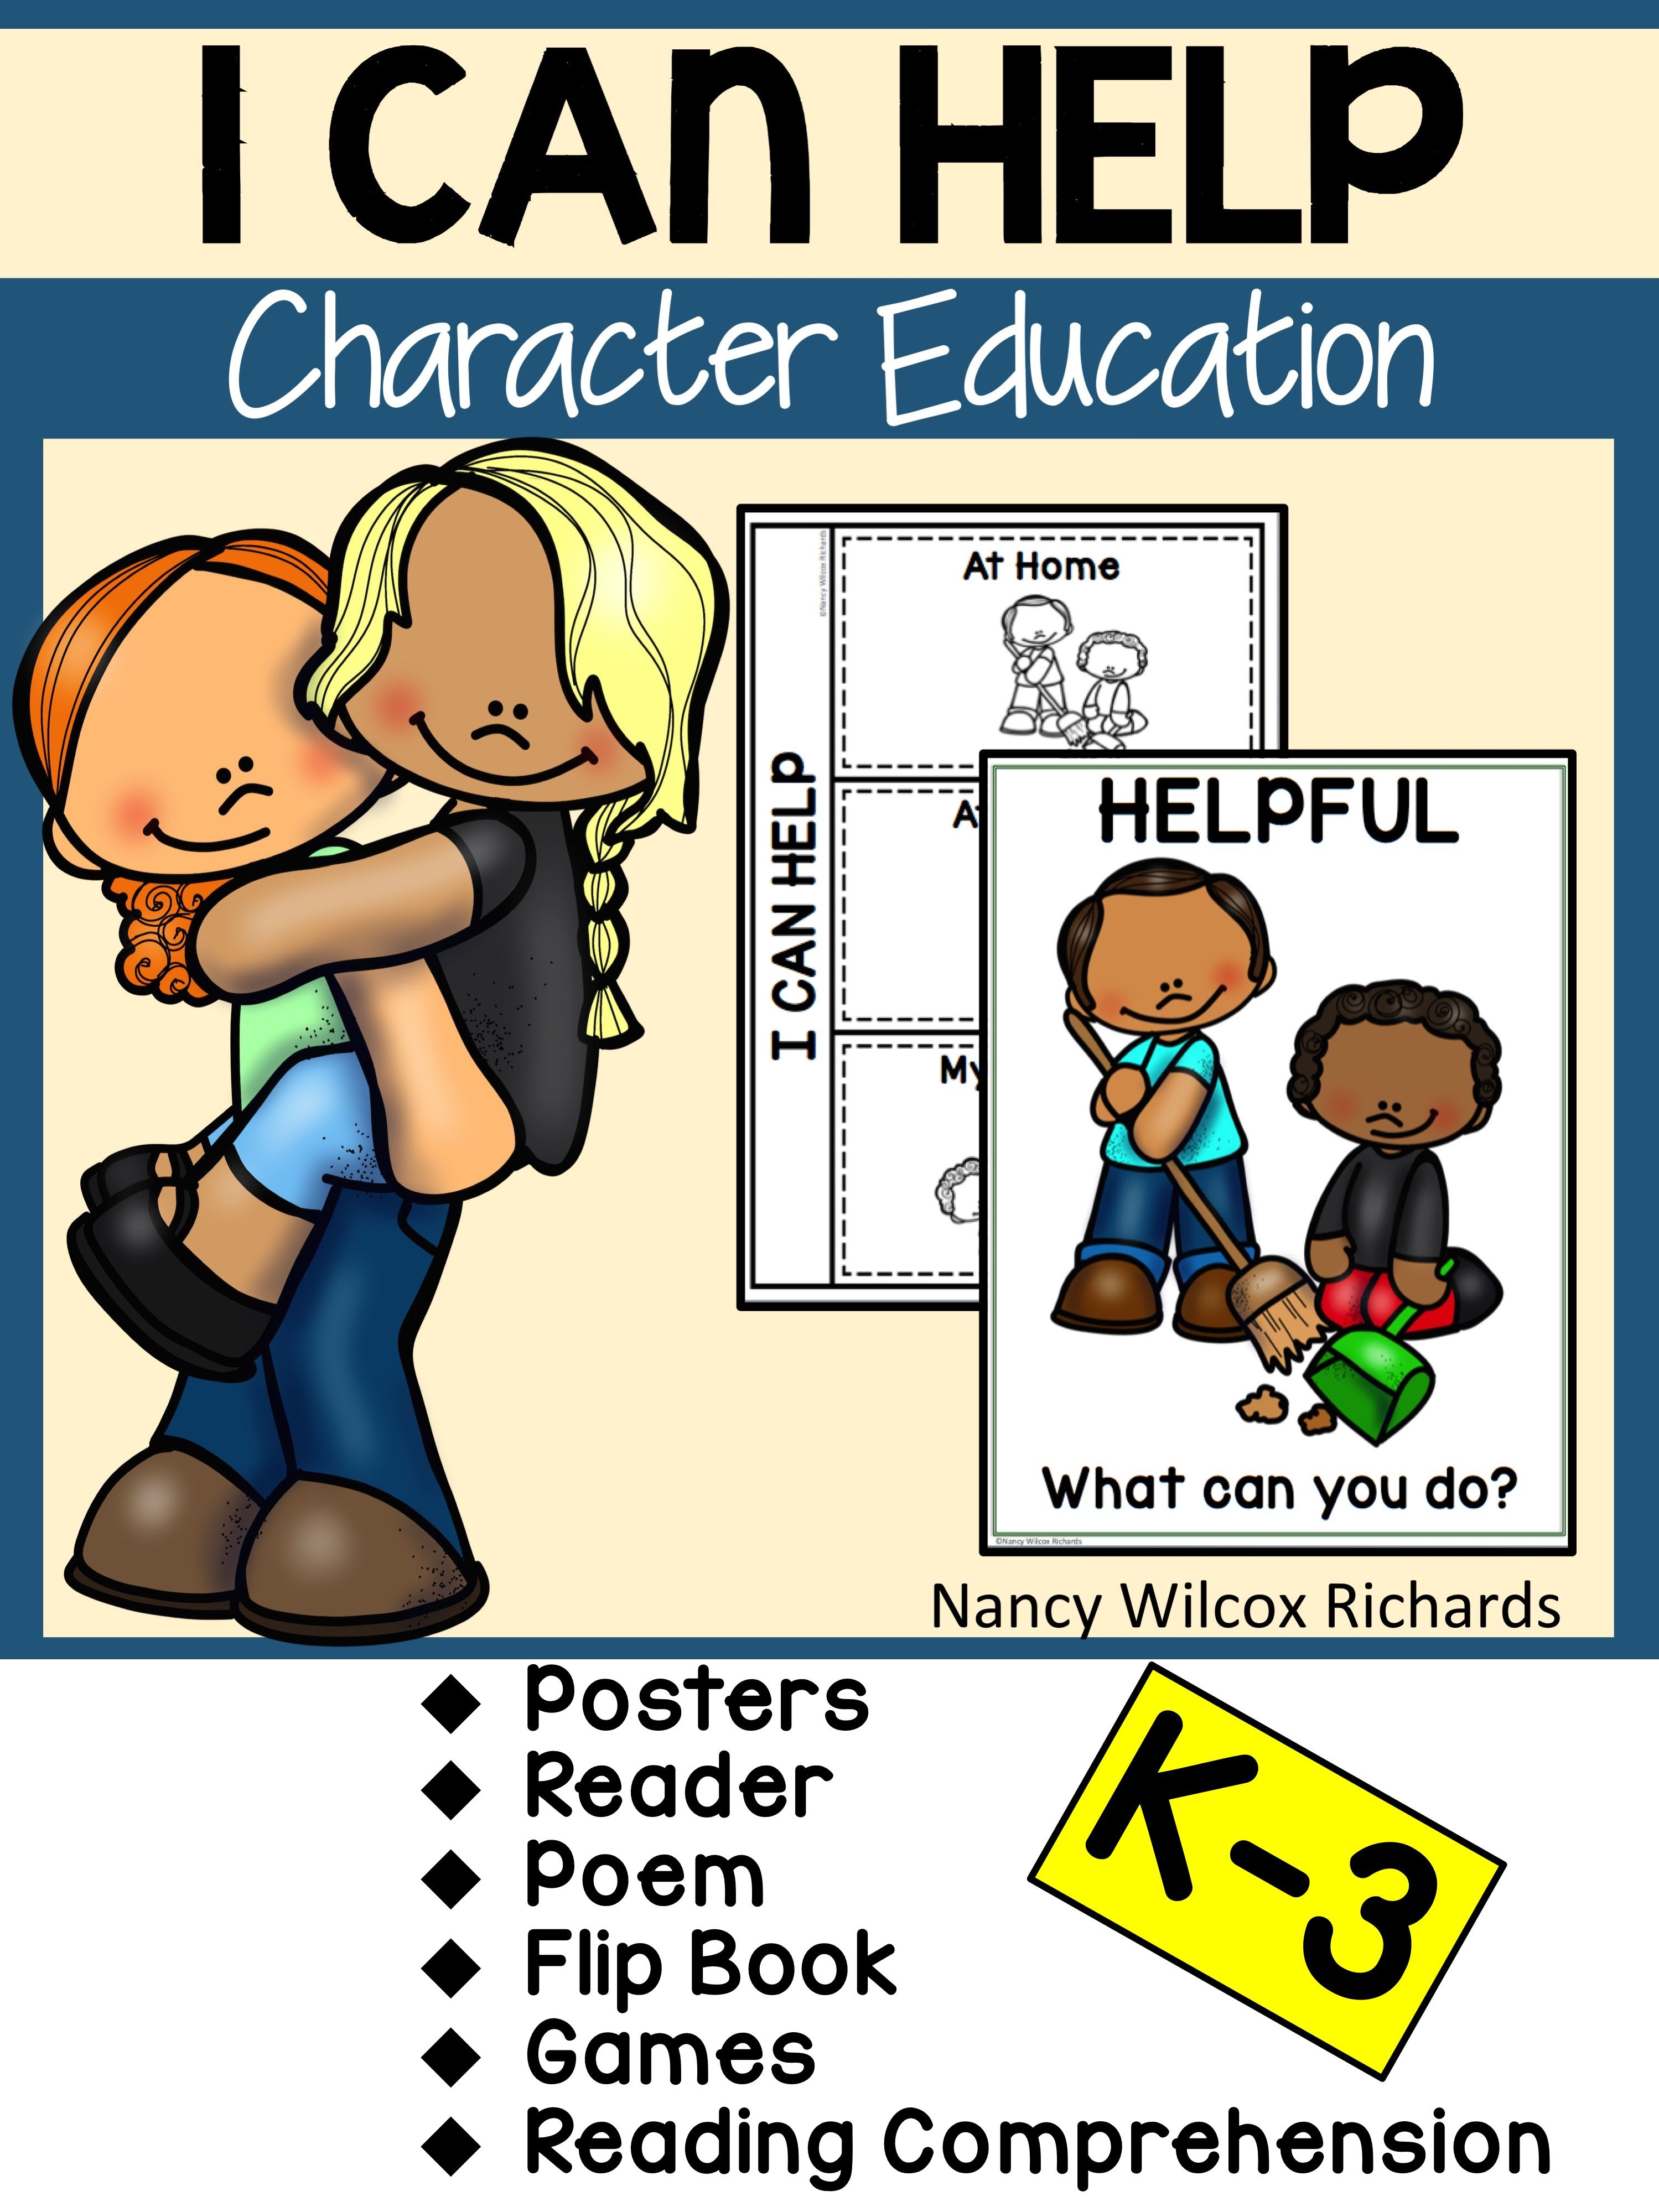 Character Education Helpful